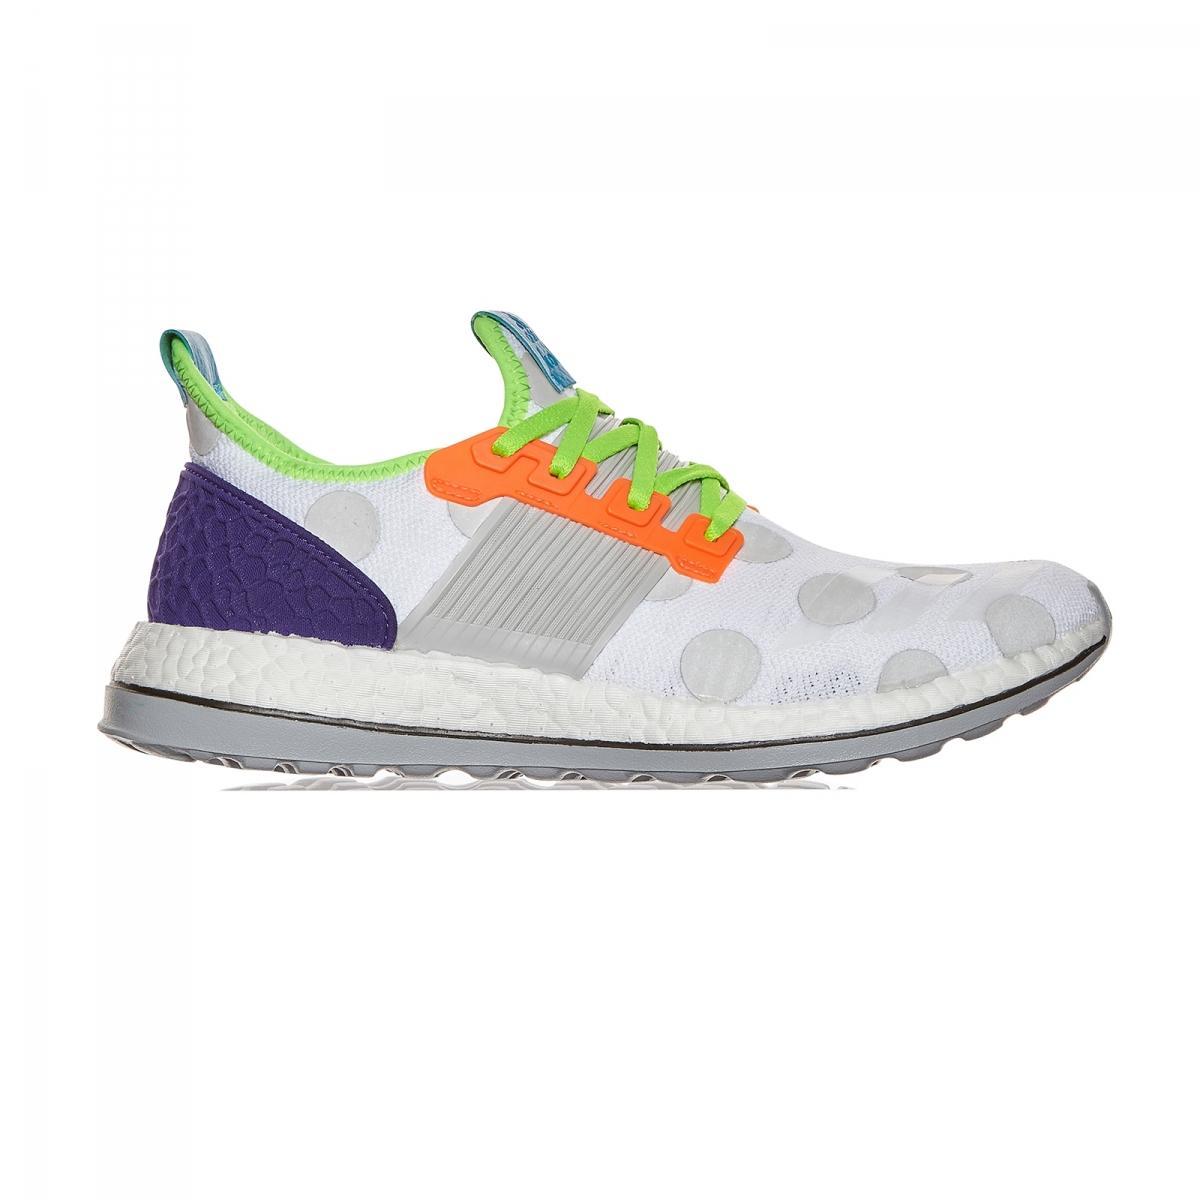 Saucony Women Shoes White Neon